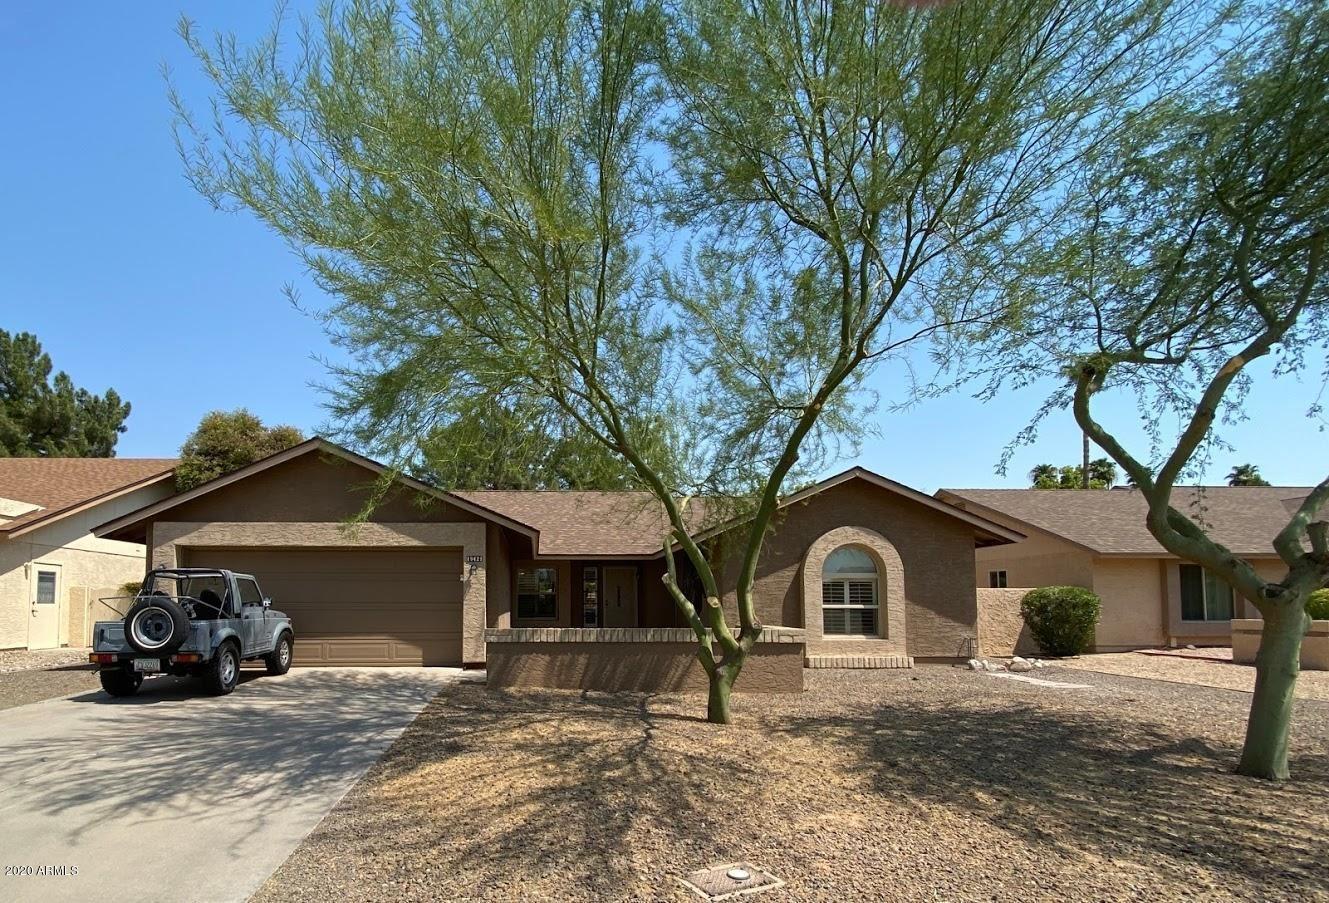 19421 N 98TH Avenue, Peoria, AZ 85382 - MLS#: 6119832